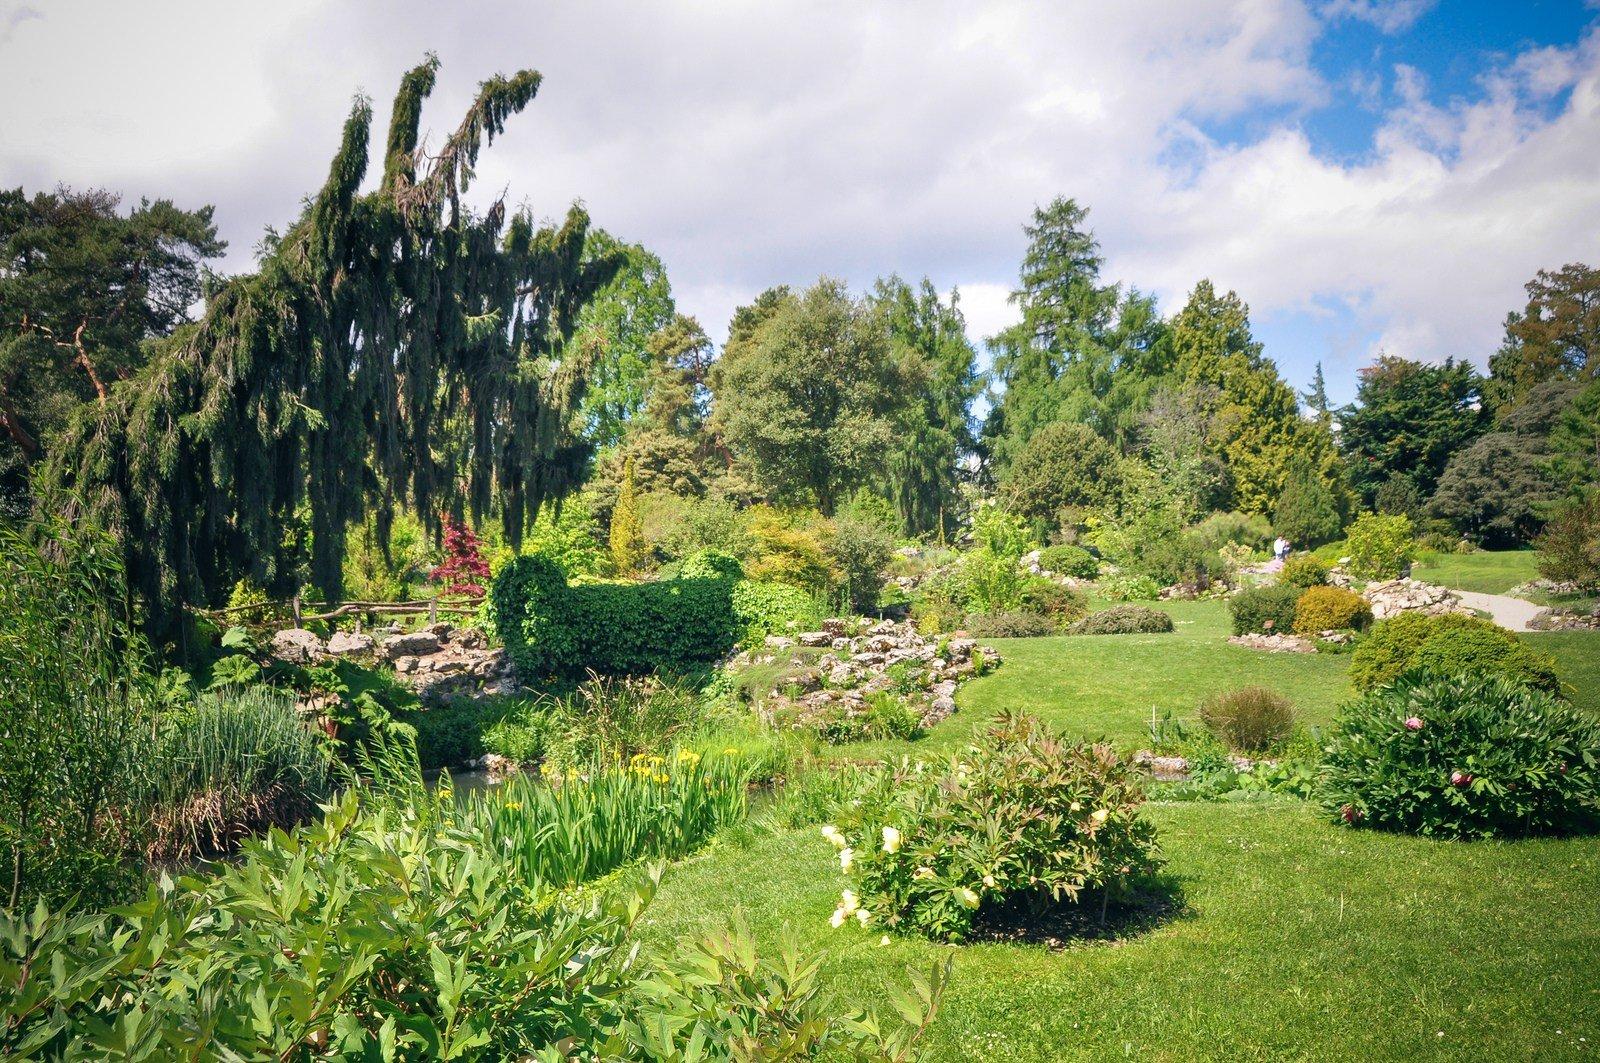 jardin botanique genve - Jardin Botanique Geneve